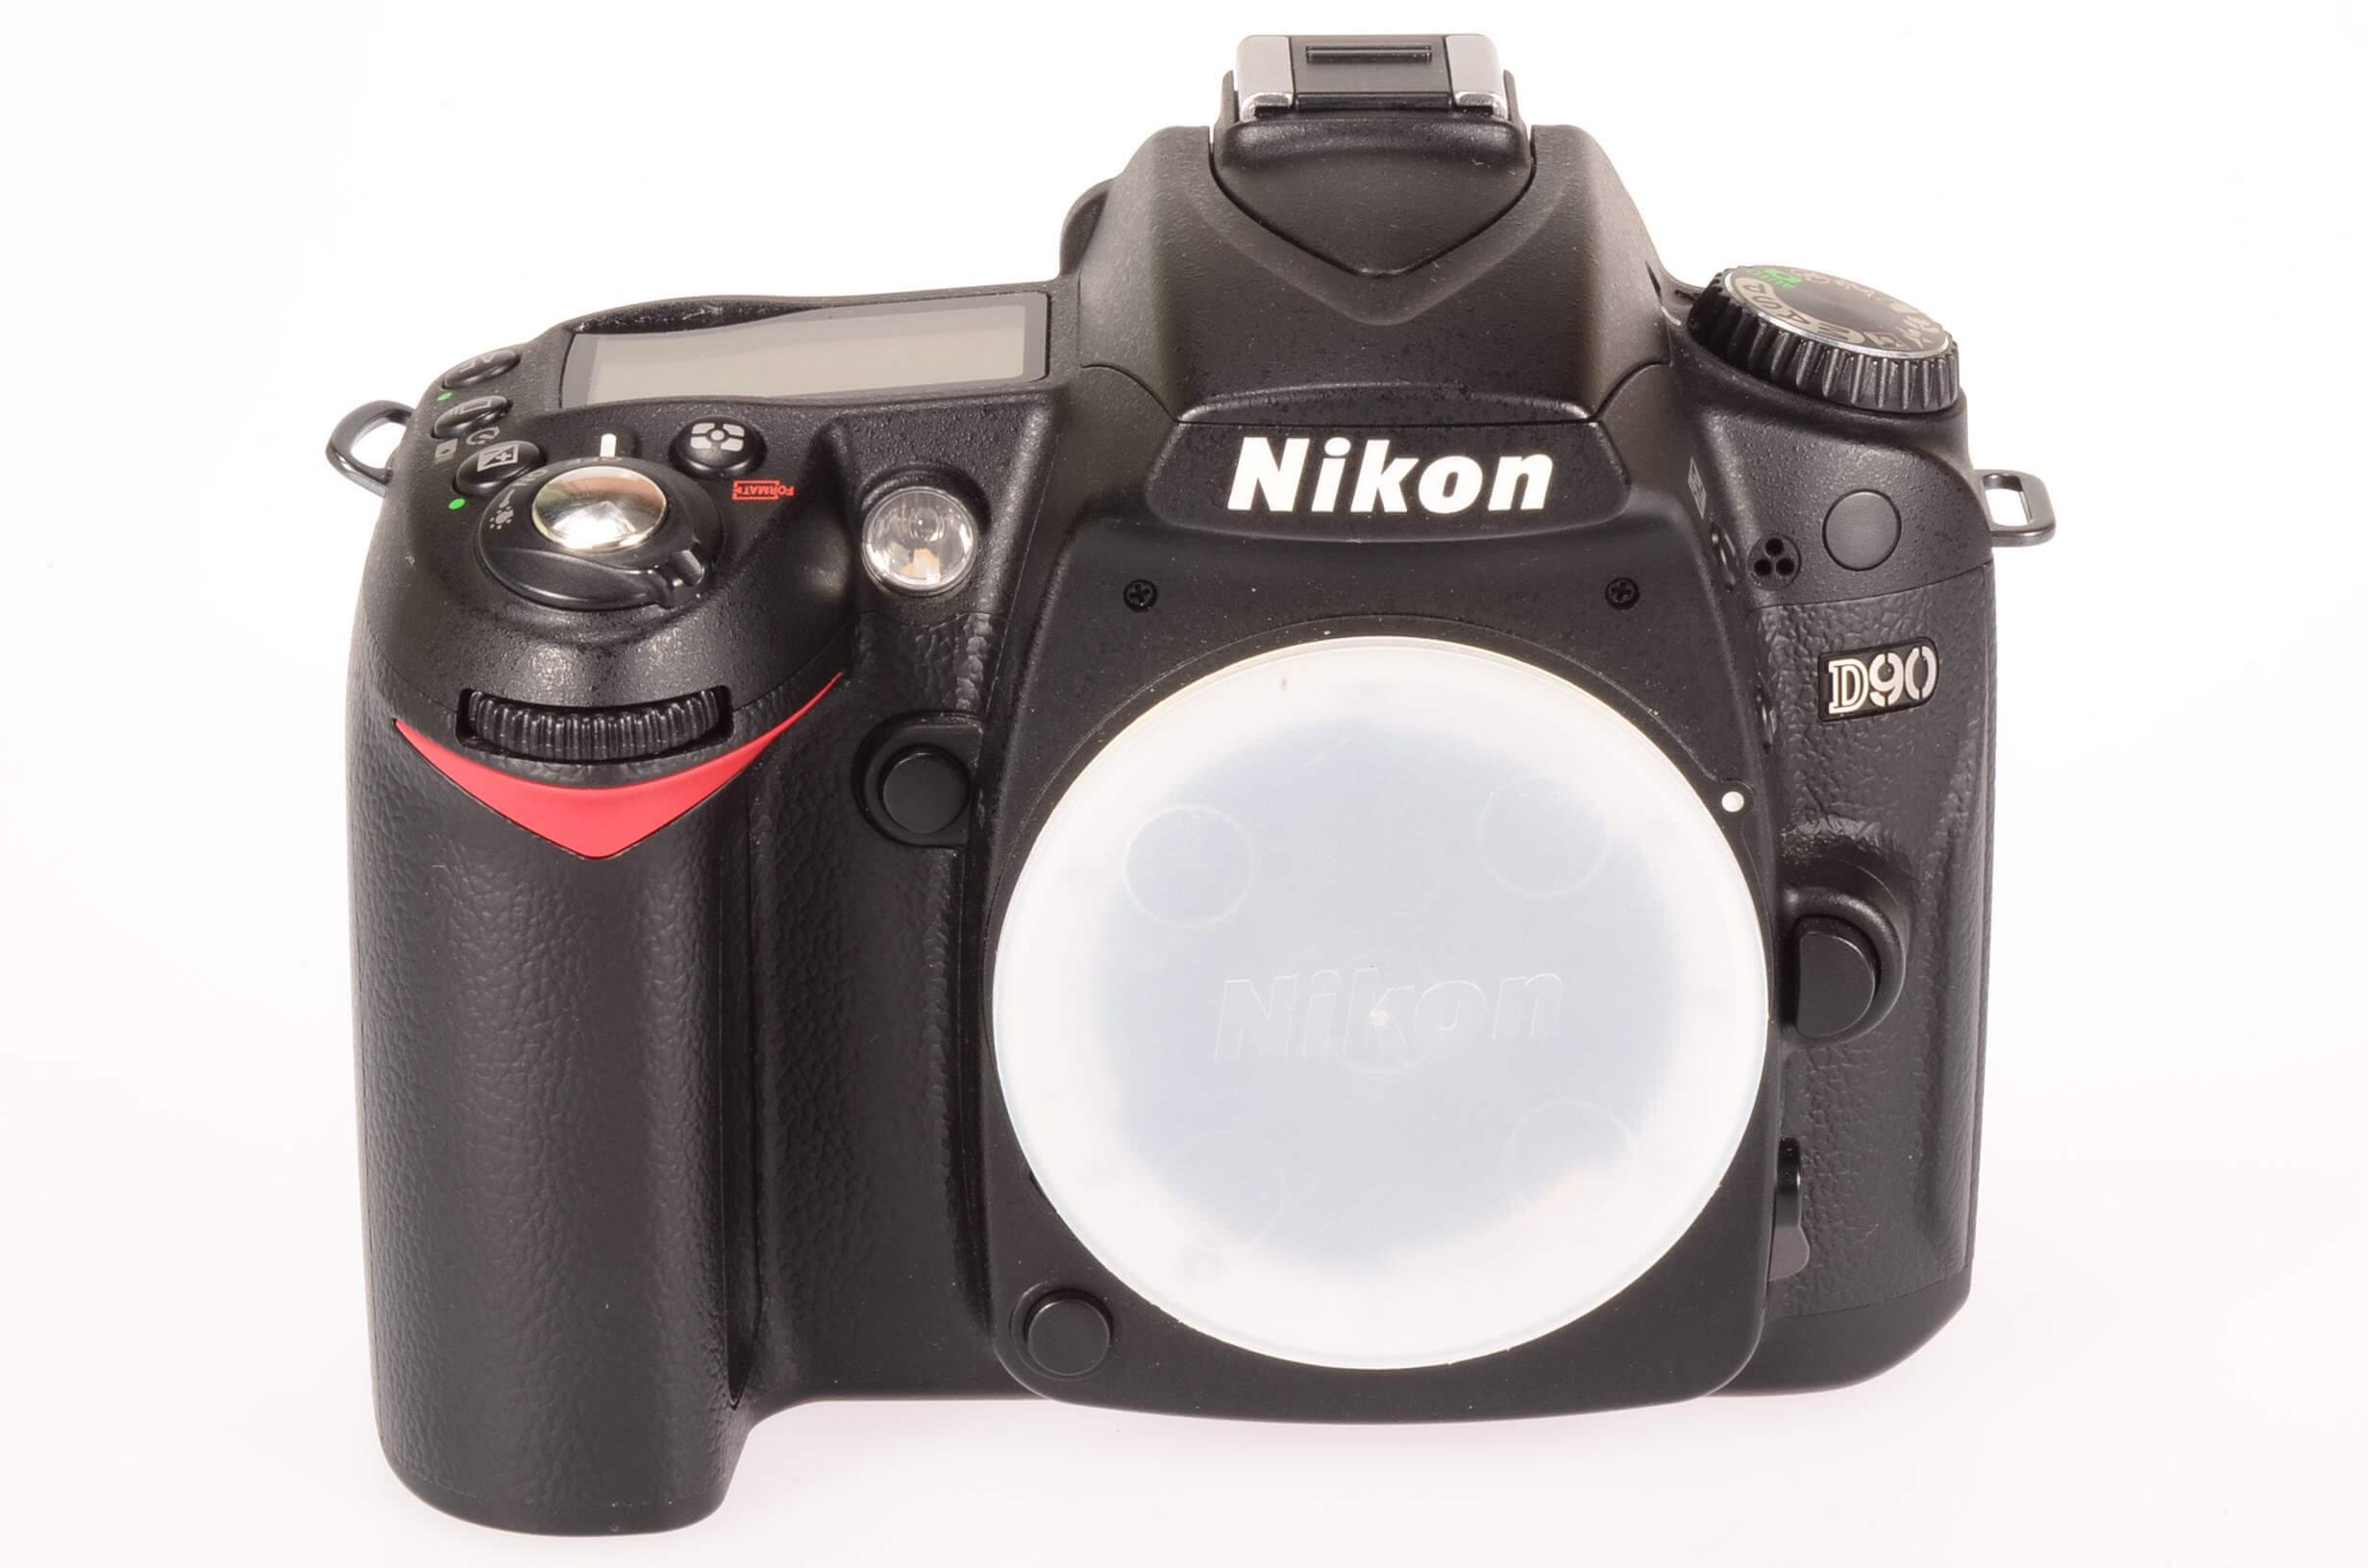 Nikon D90 body, 543 actuations, virtually mint!